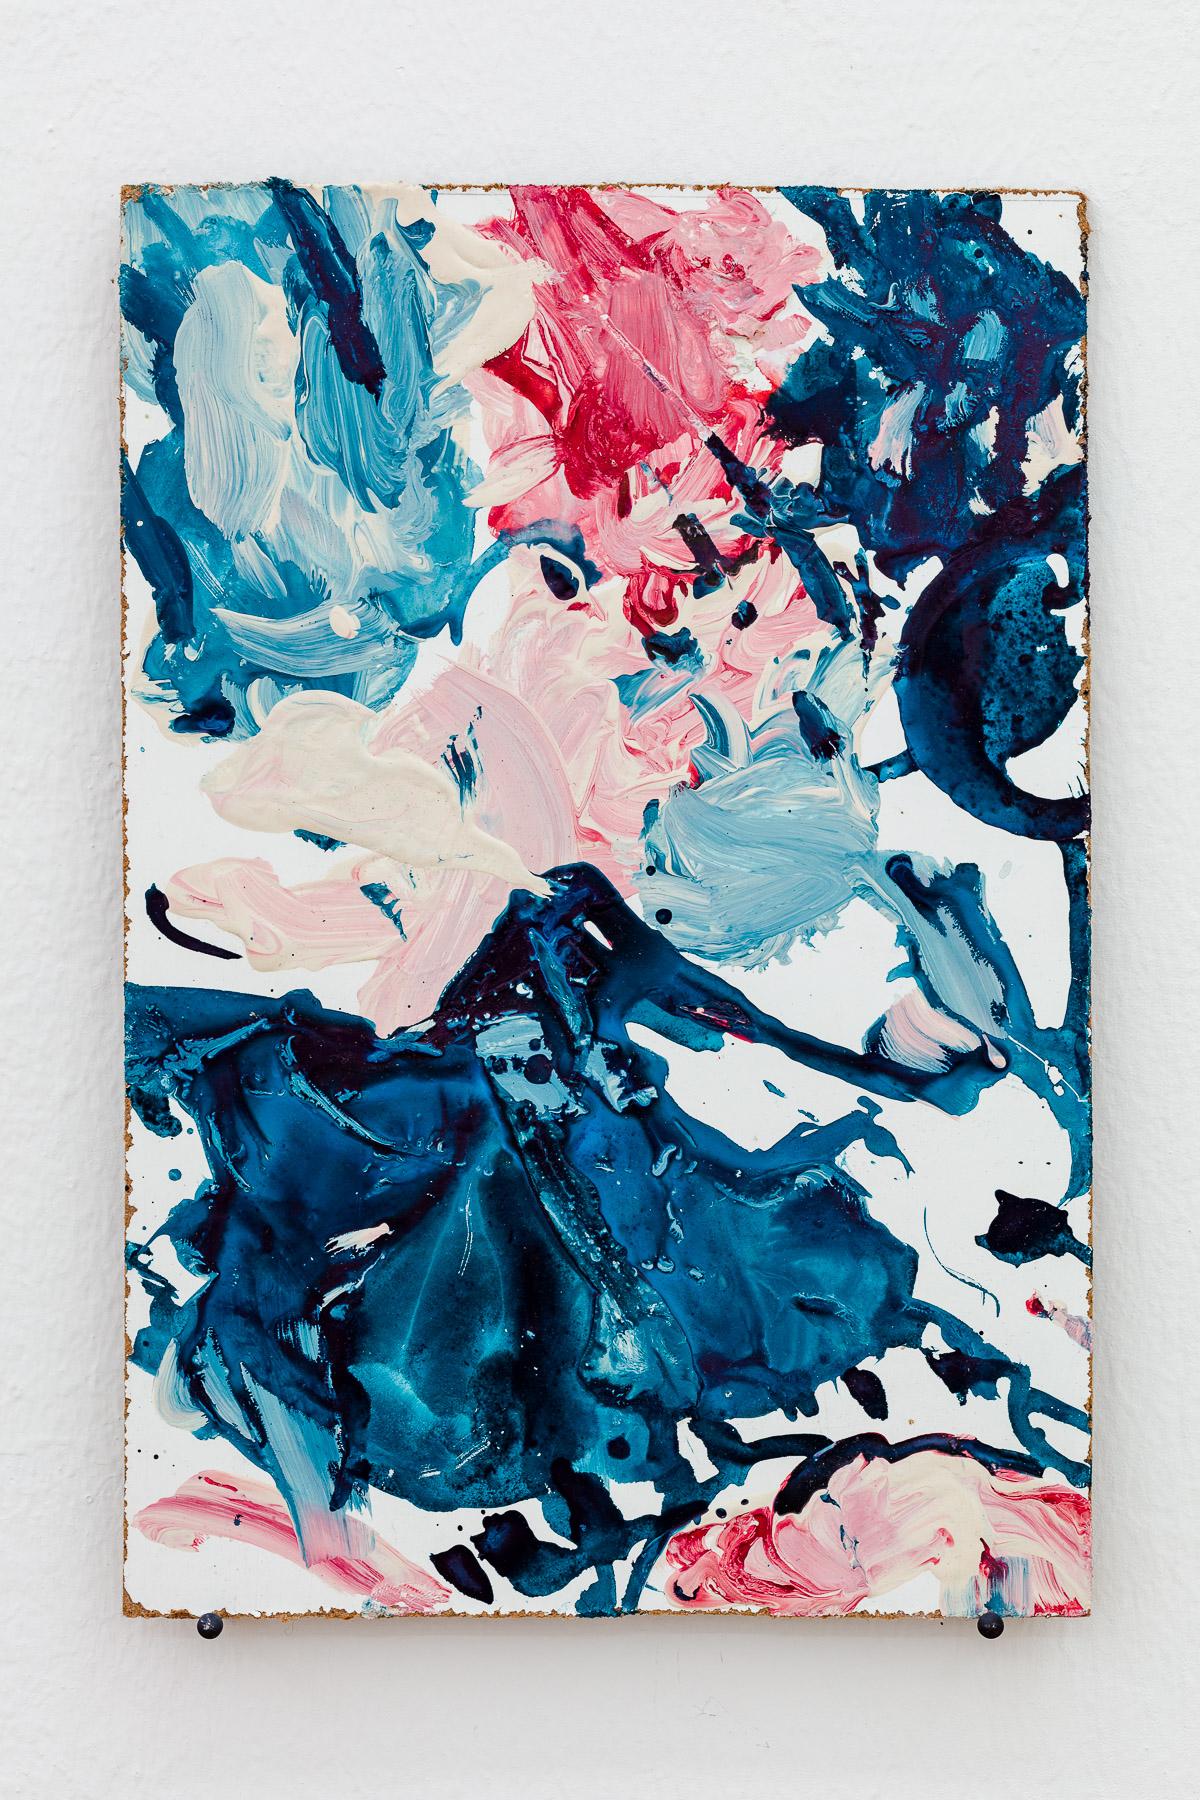 2019_05_20_Elke-Krystufek_Croy-Nielsen_by-kunst-dokumentation-com_018_web.jpg